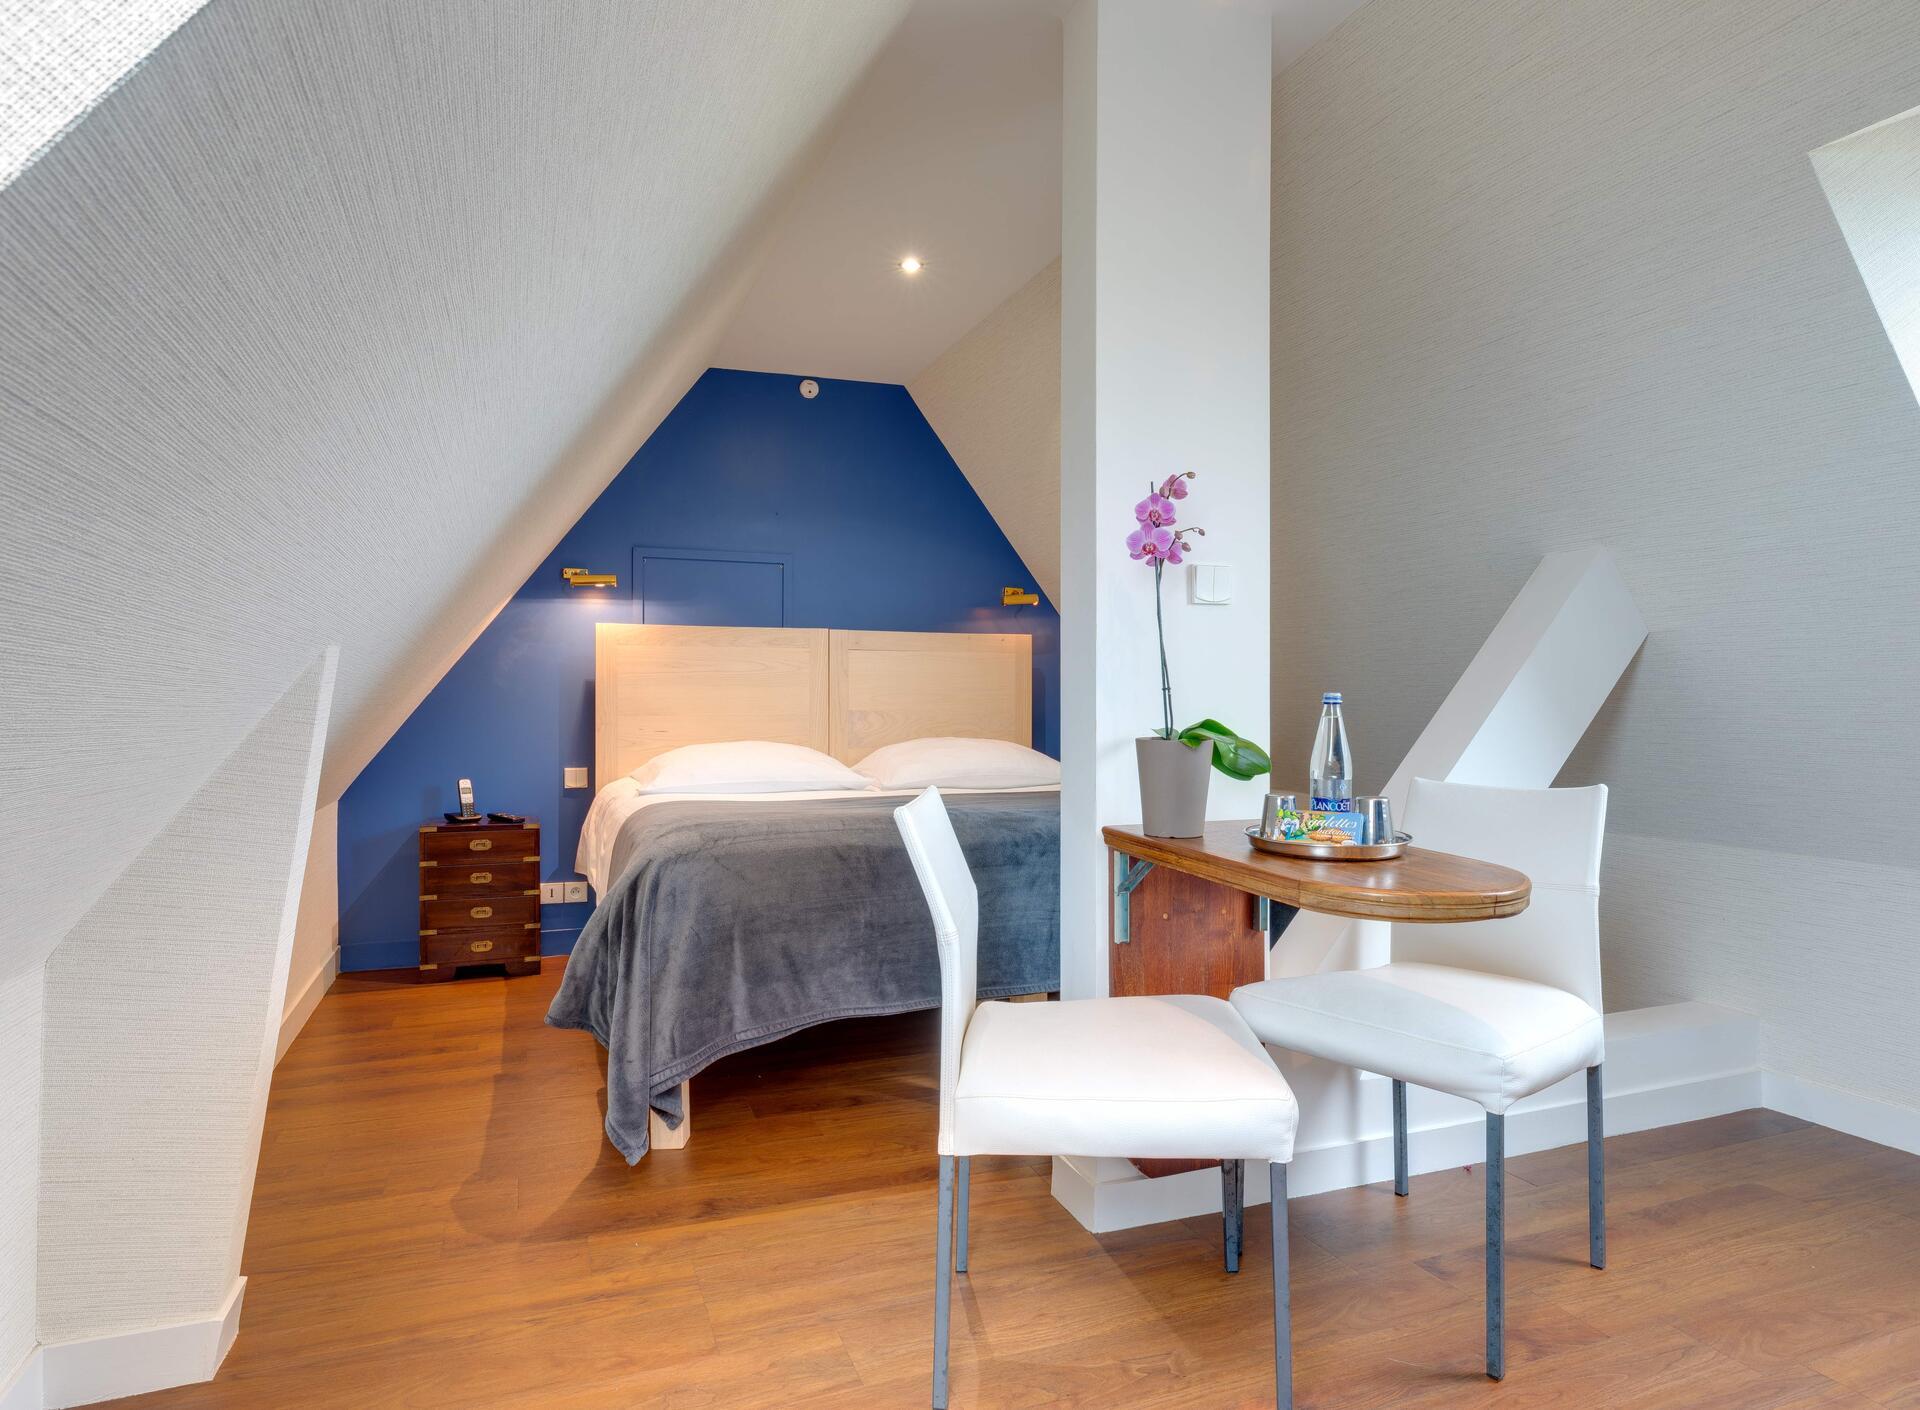 Accommodation at Ar Men Du Hotel in Névez, Brittany